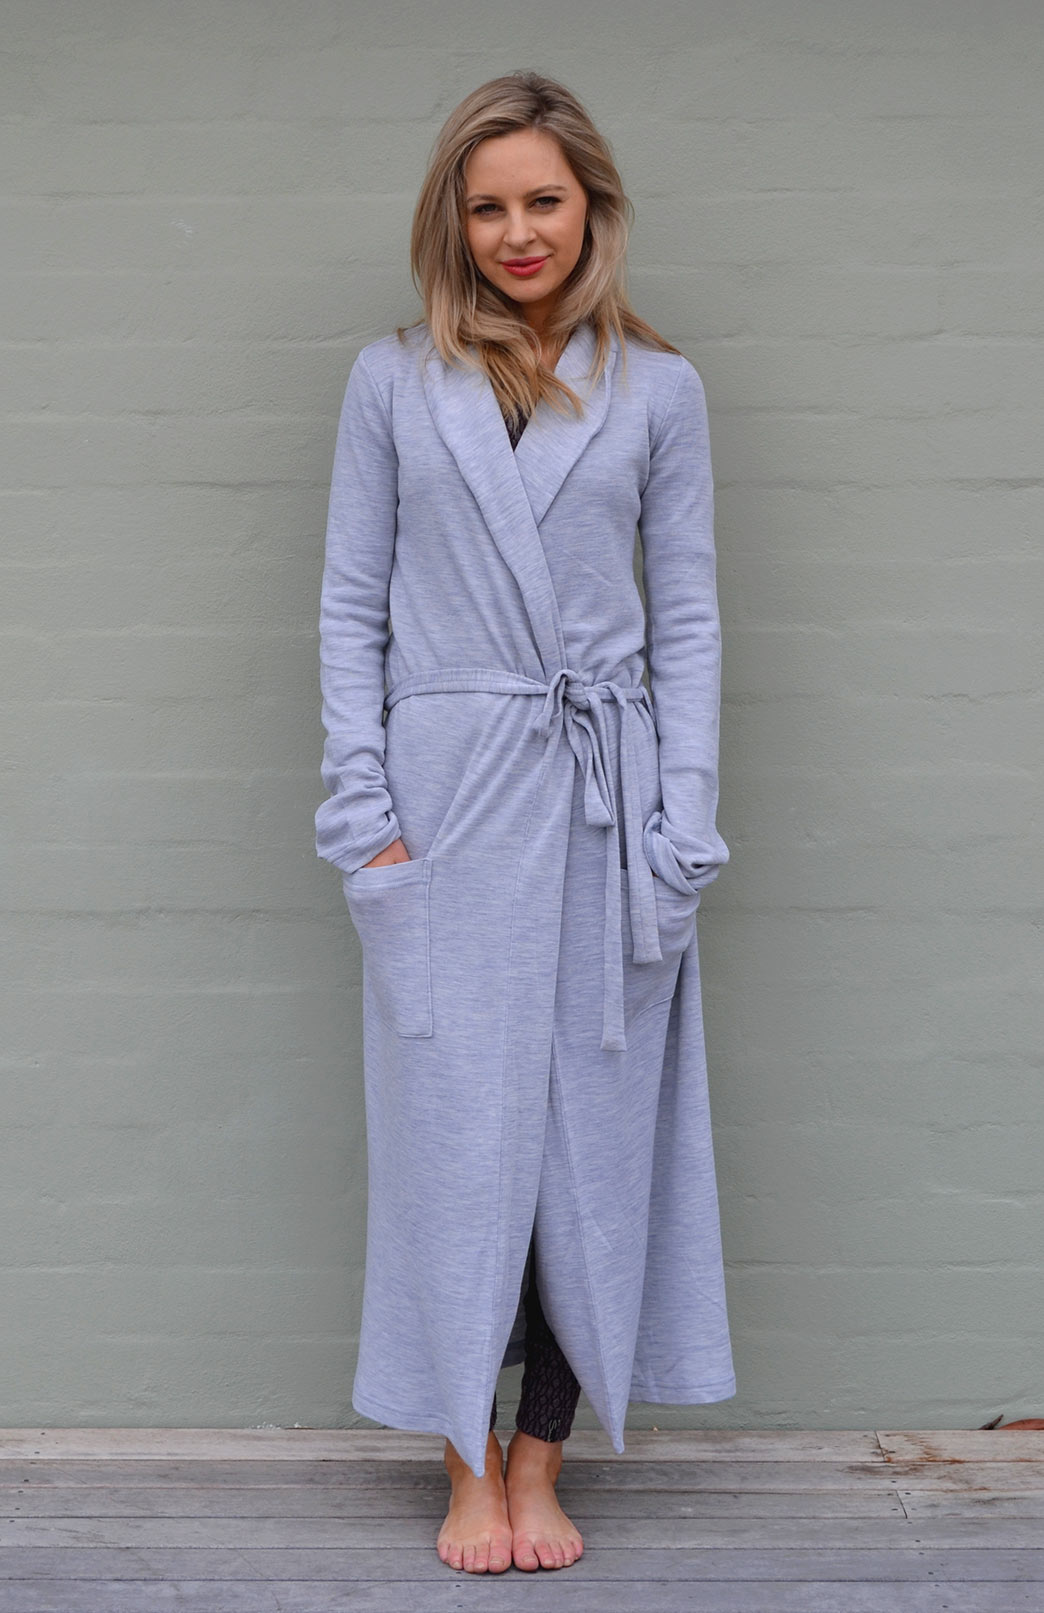 Dressing Gown - Heavyweight - Women's Soft Grey Superfine Merino Wool Dressing Gown with Tie and Side Pockets - Smitten Merino Tasmania Australia